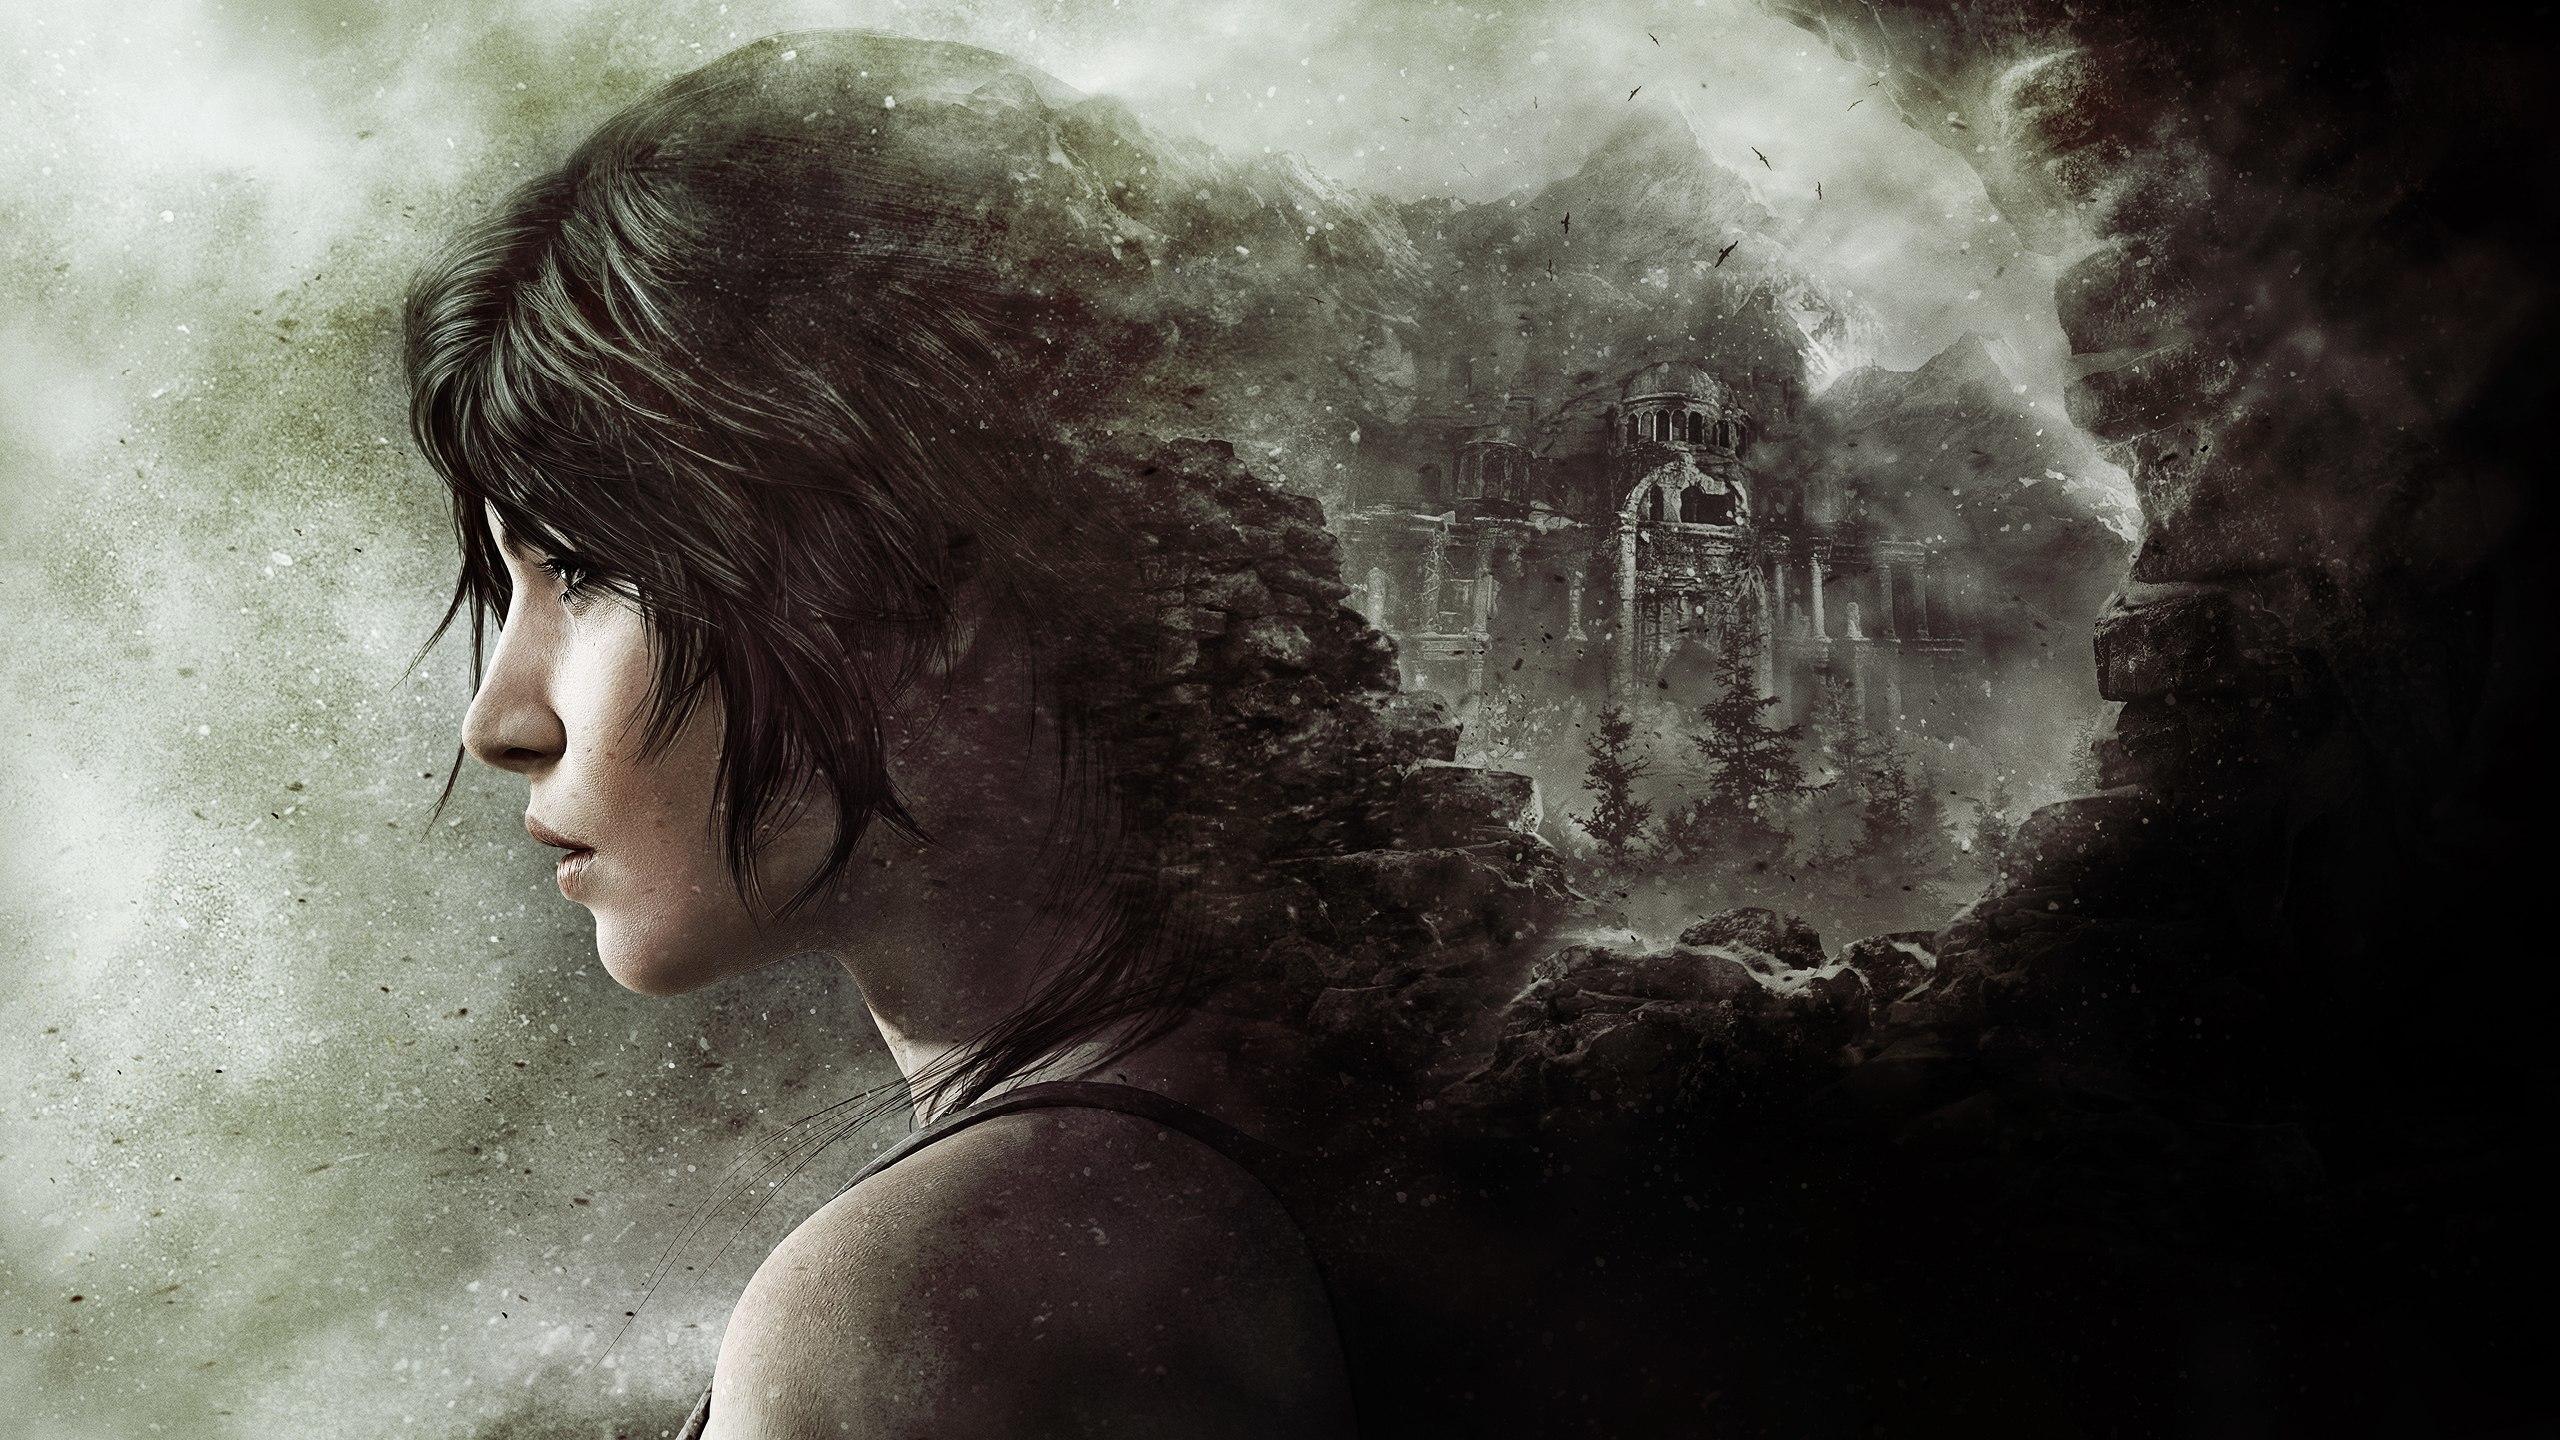 Images Rise Of The Tomb Raider Lara Croft Hair Girls Games